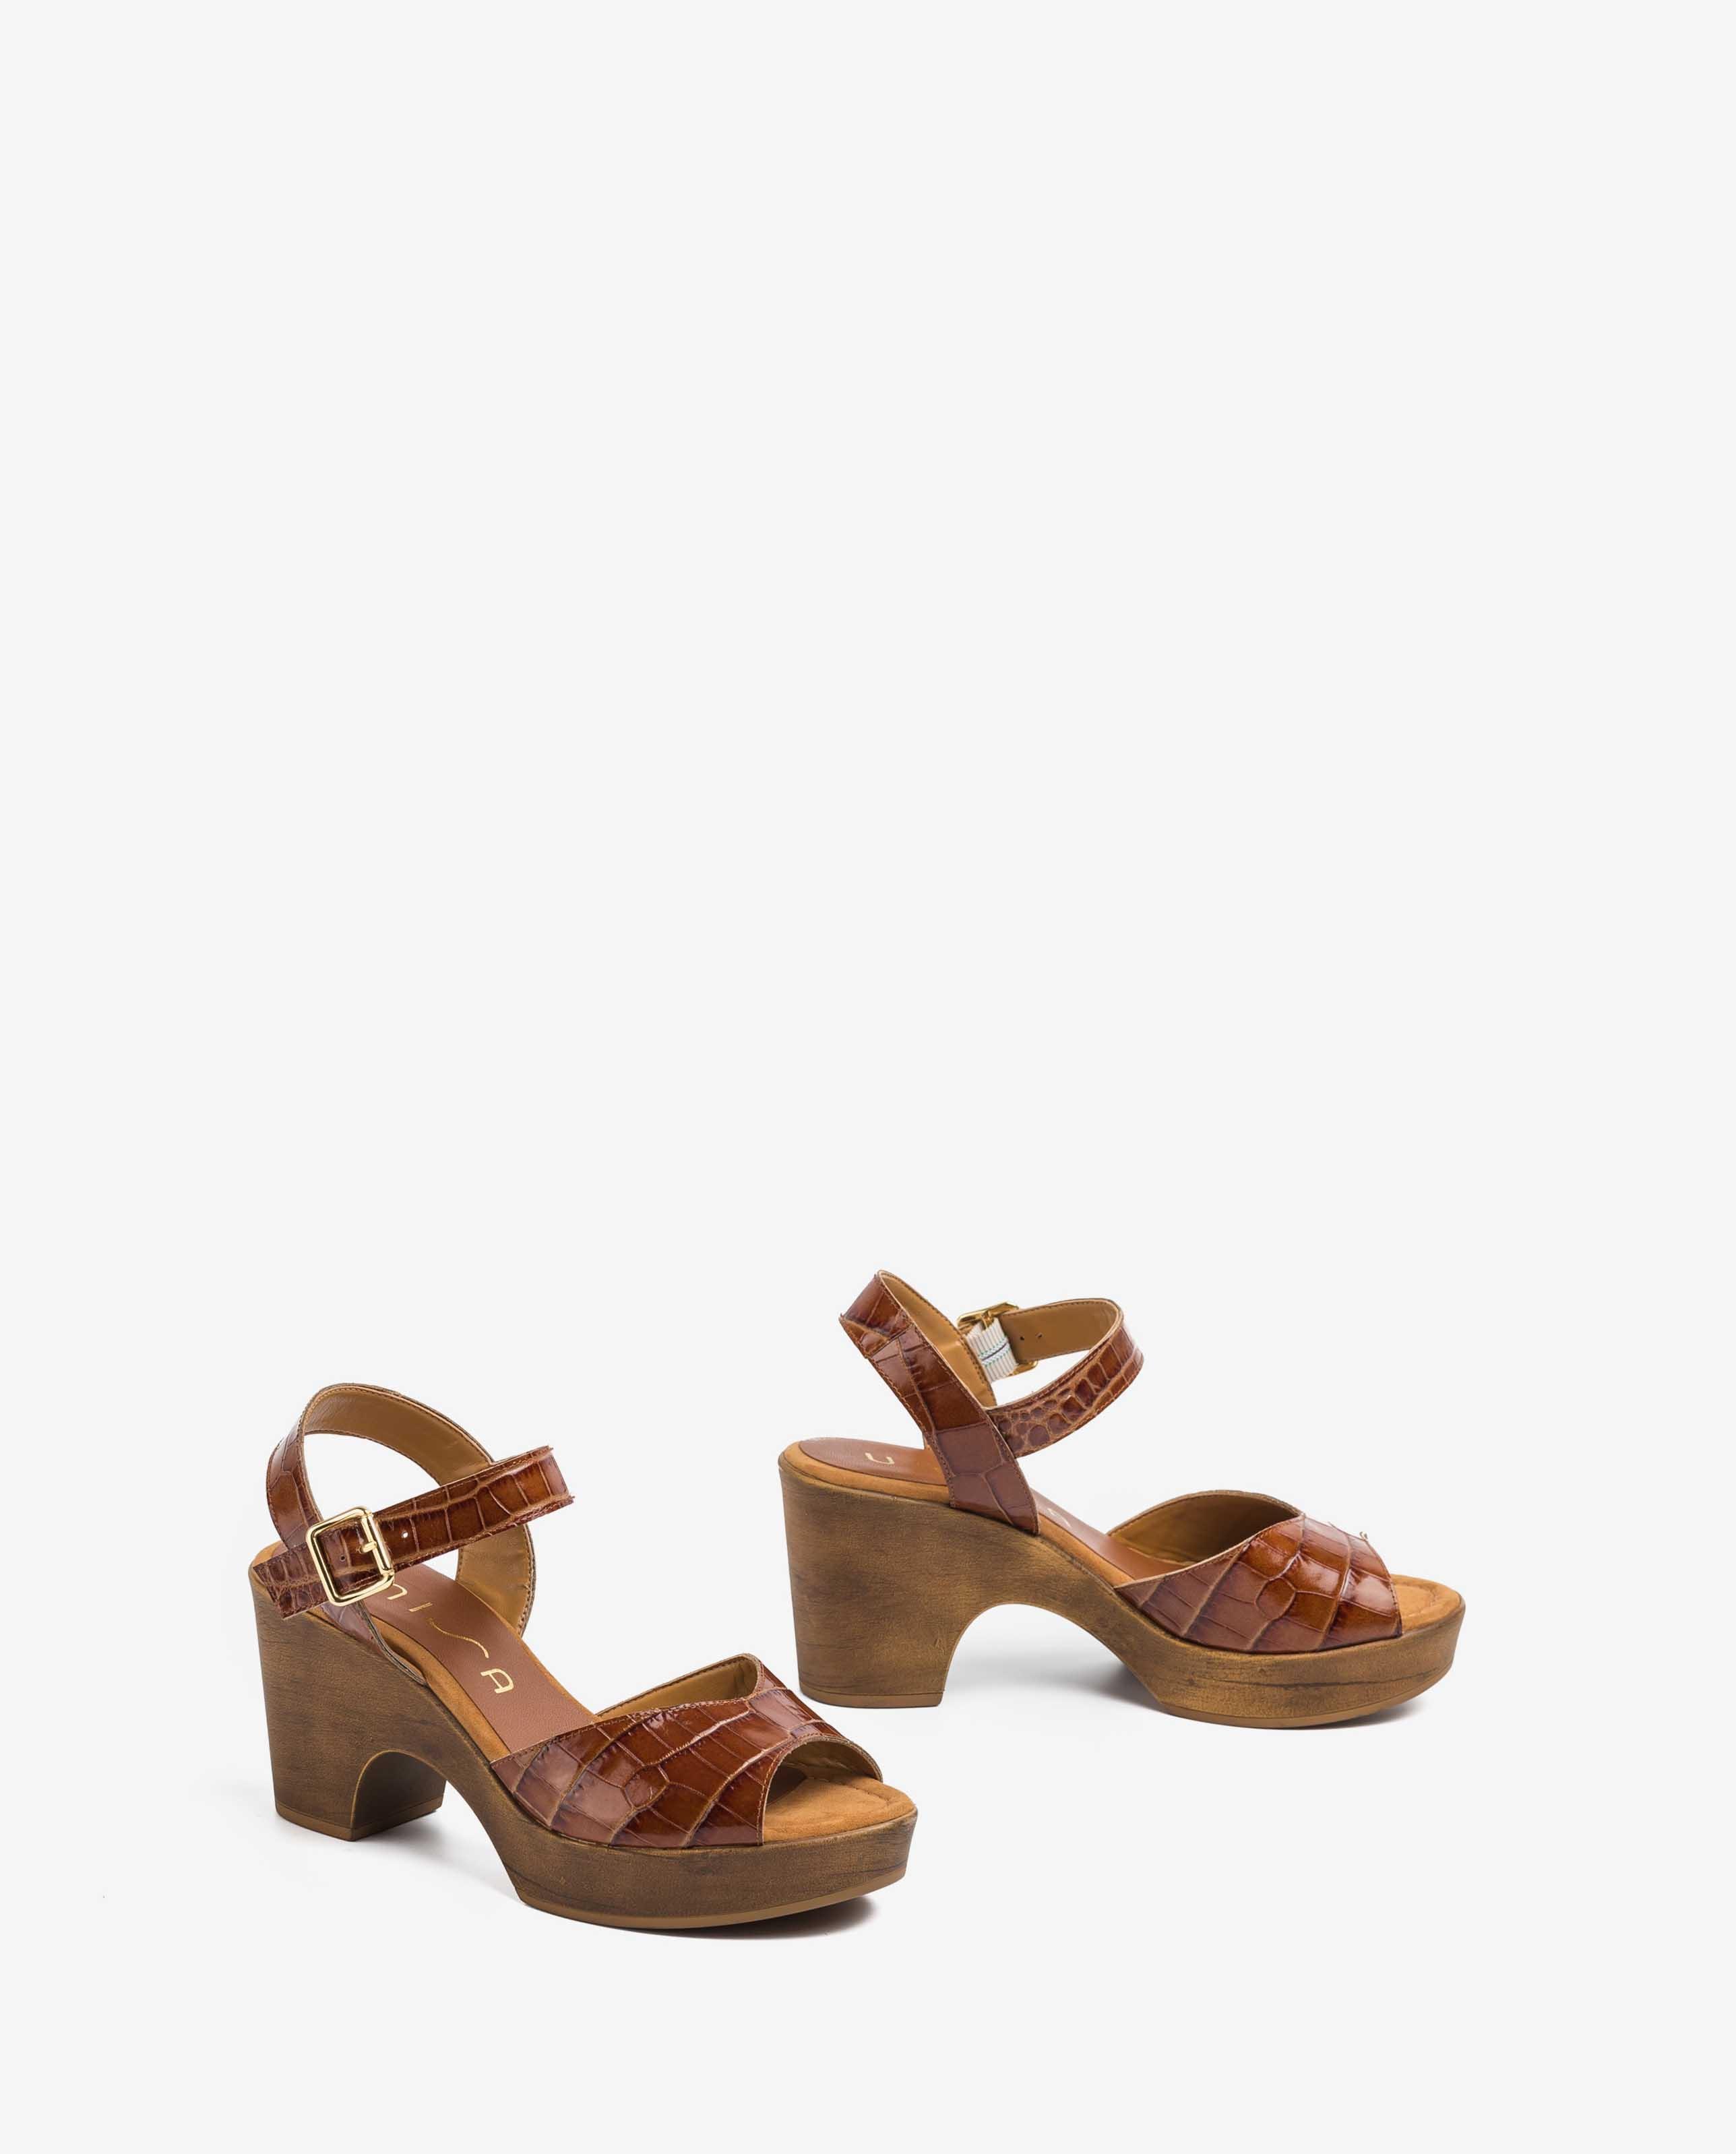 UNISA Brown croc sandals OTTIS_CRW saddle 2